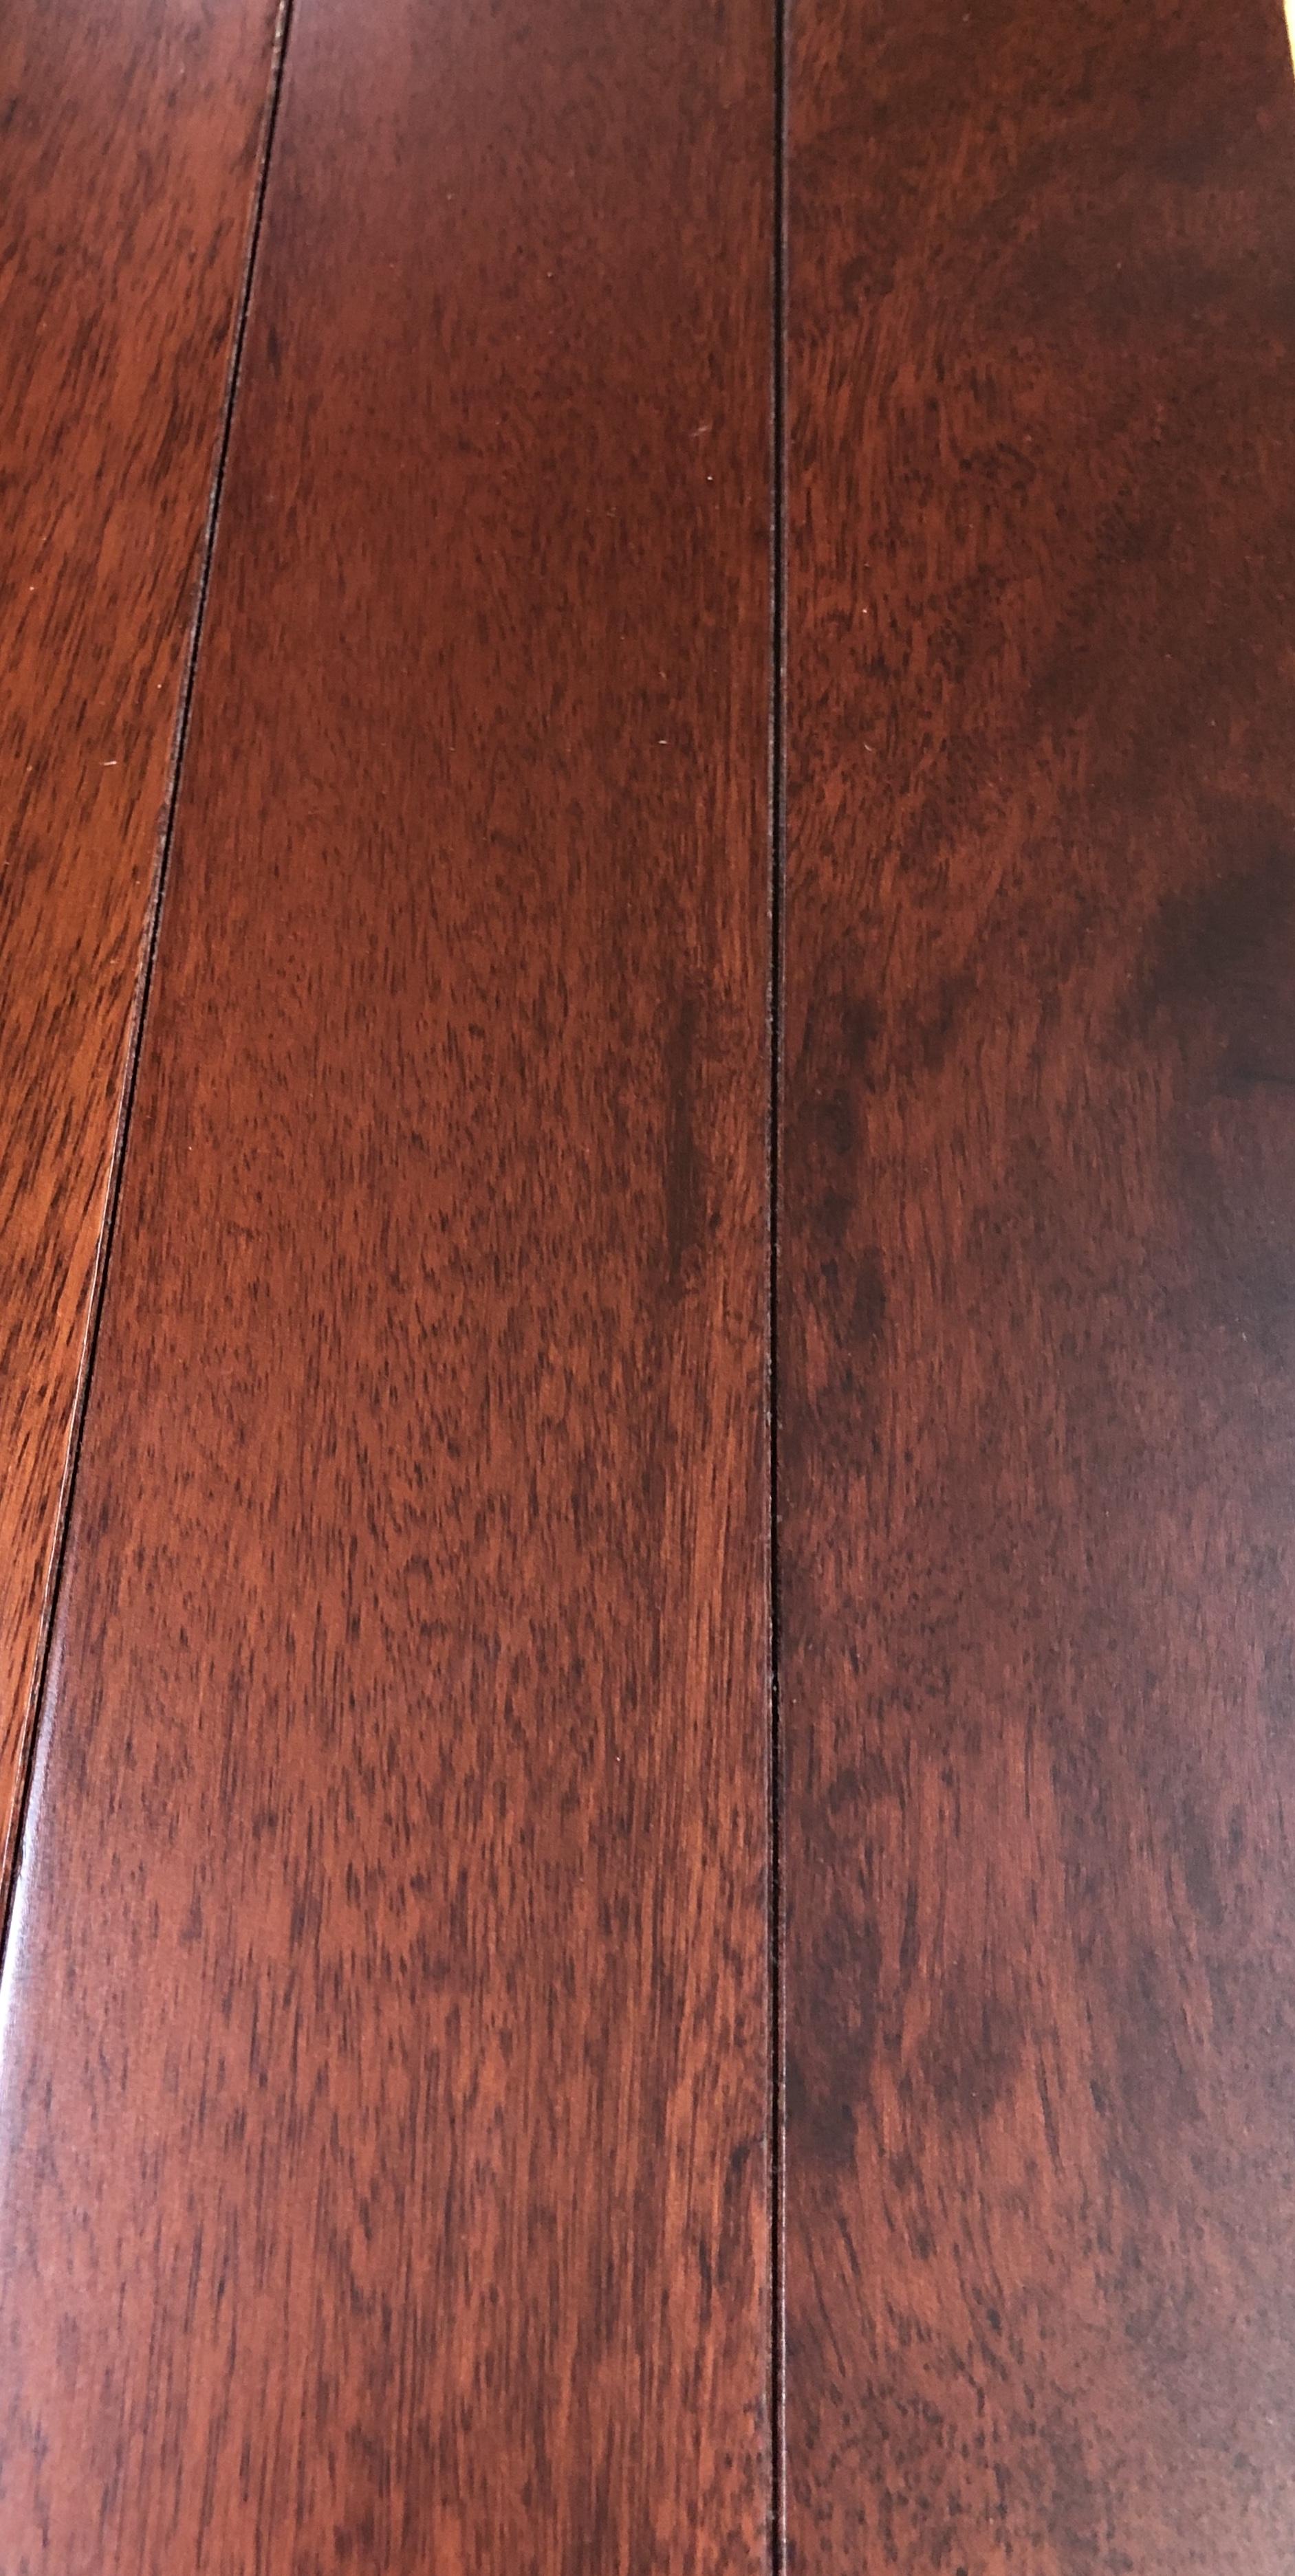 Hard Surface Special Pacific Mahogany, Pacific Cherry Laminate Flooring